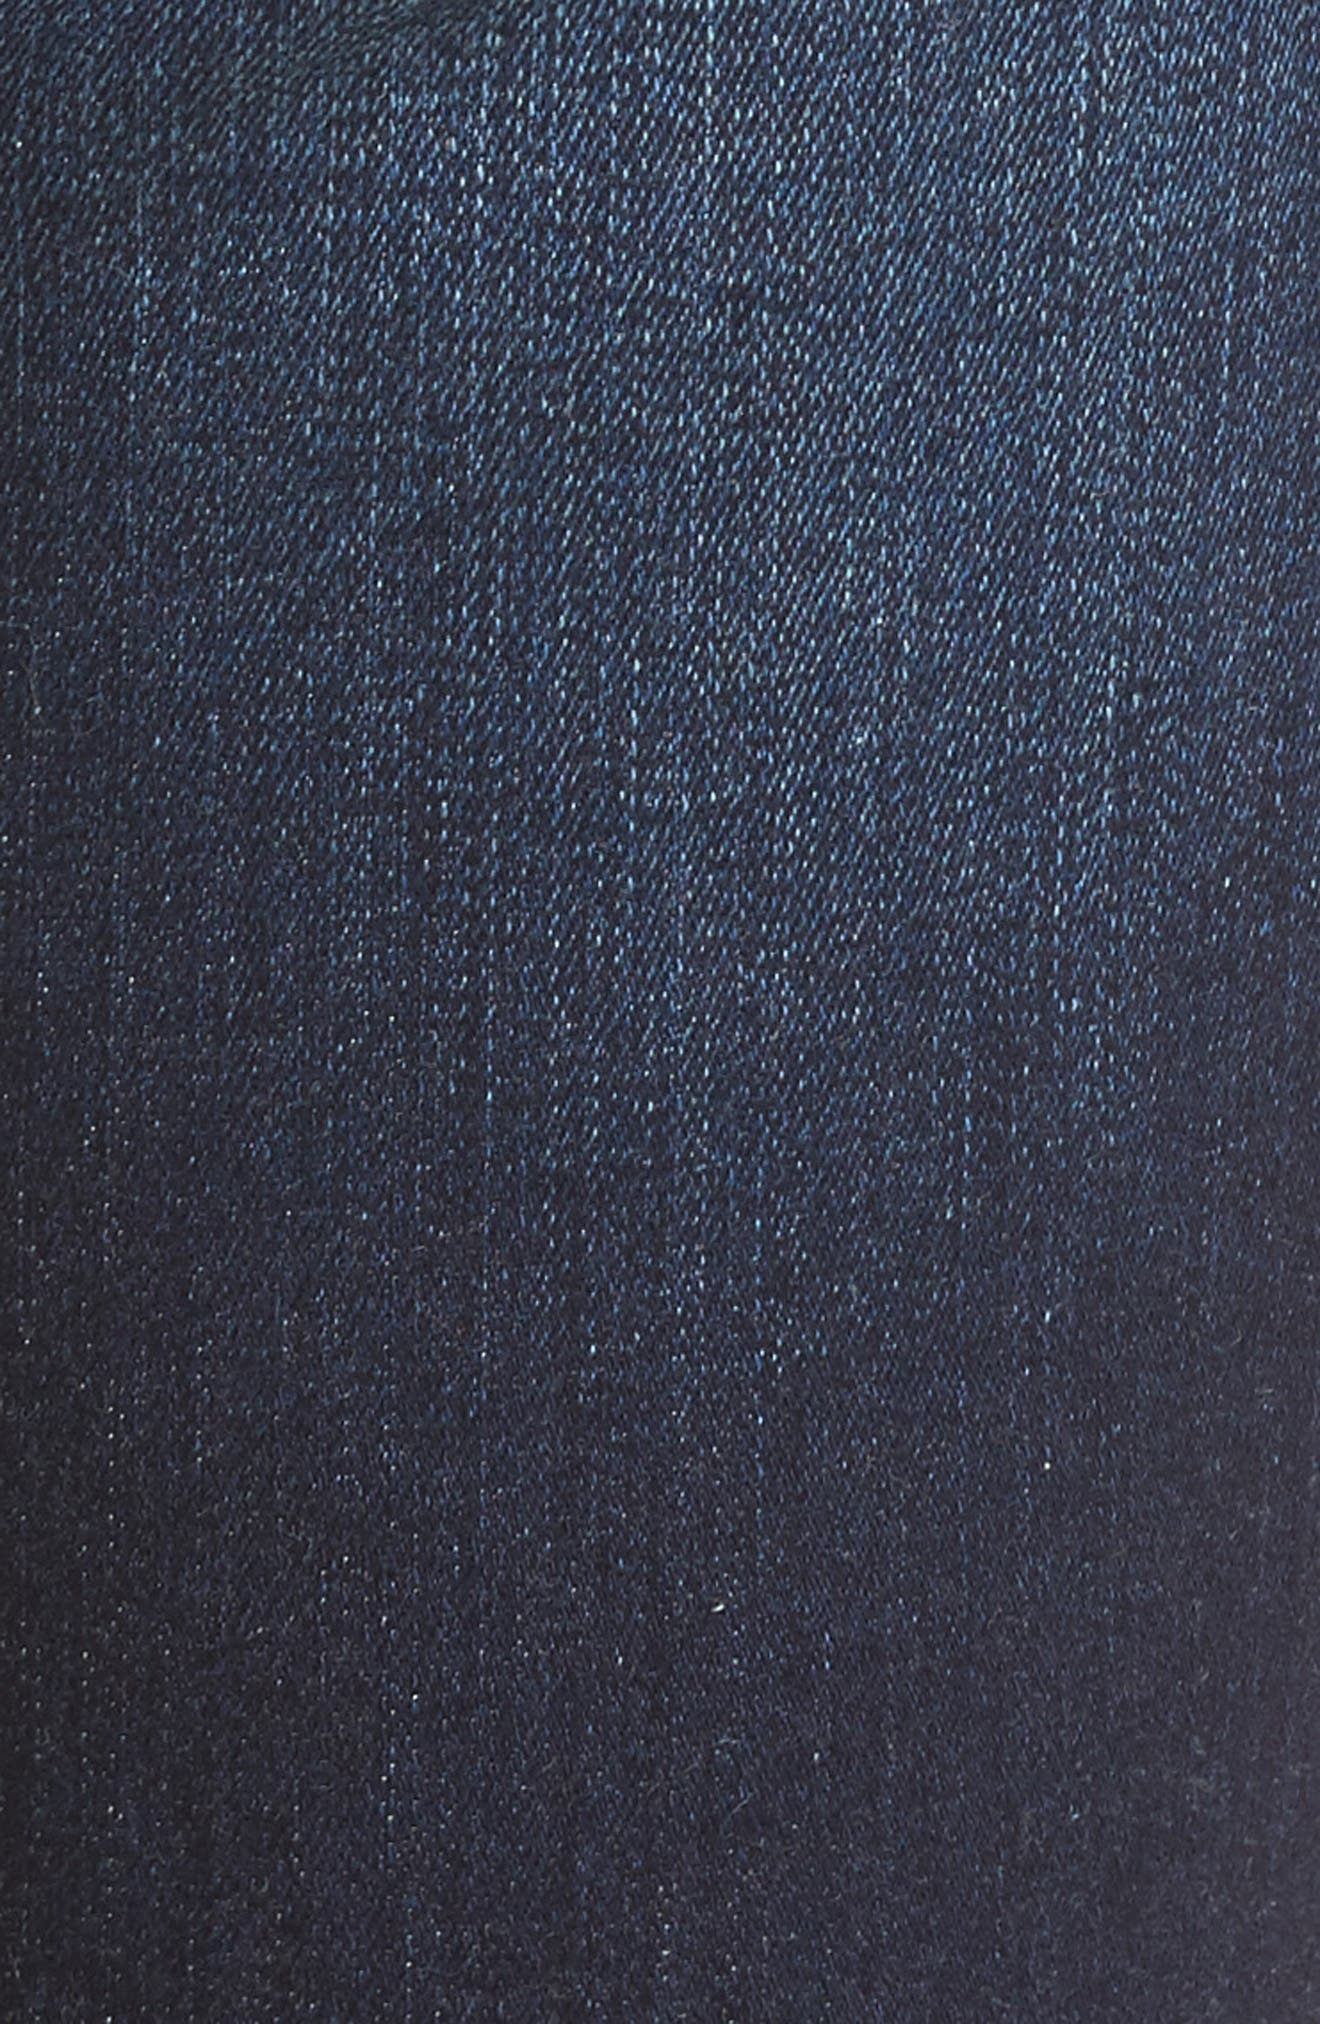 Alina Release Hem Stretch Ankle Jeans,                             Alternate thumbnail 6, color,                             Bezel